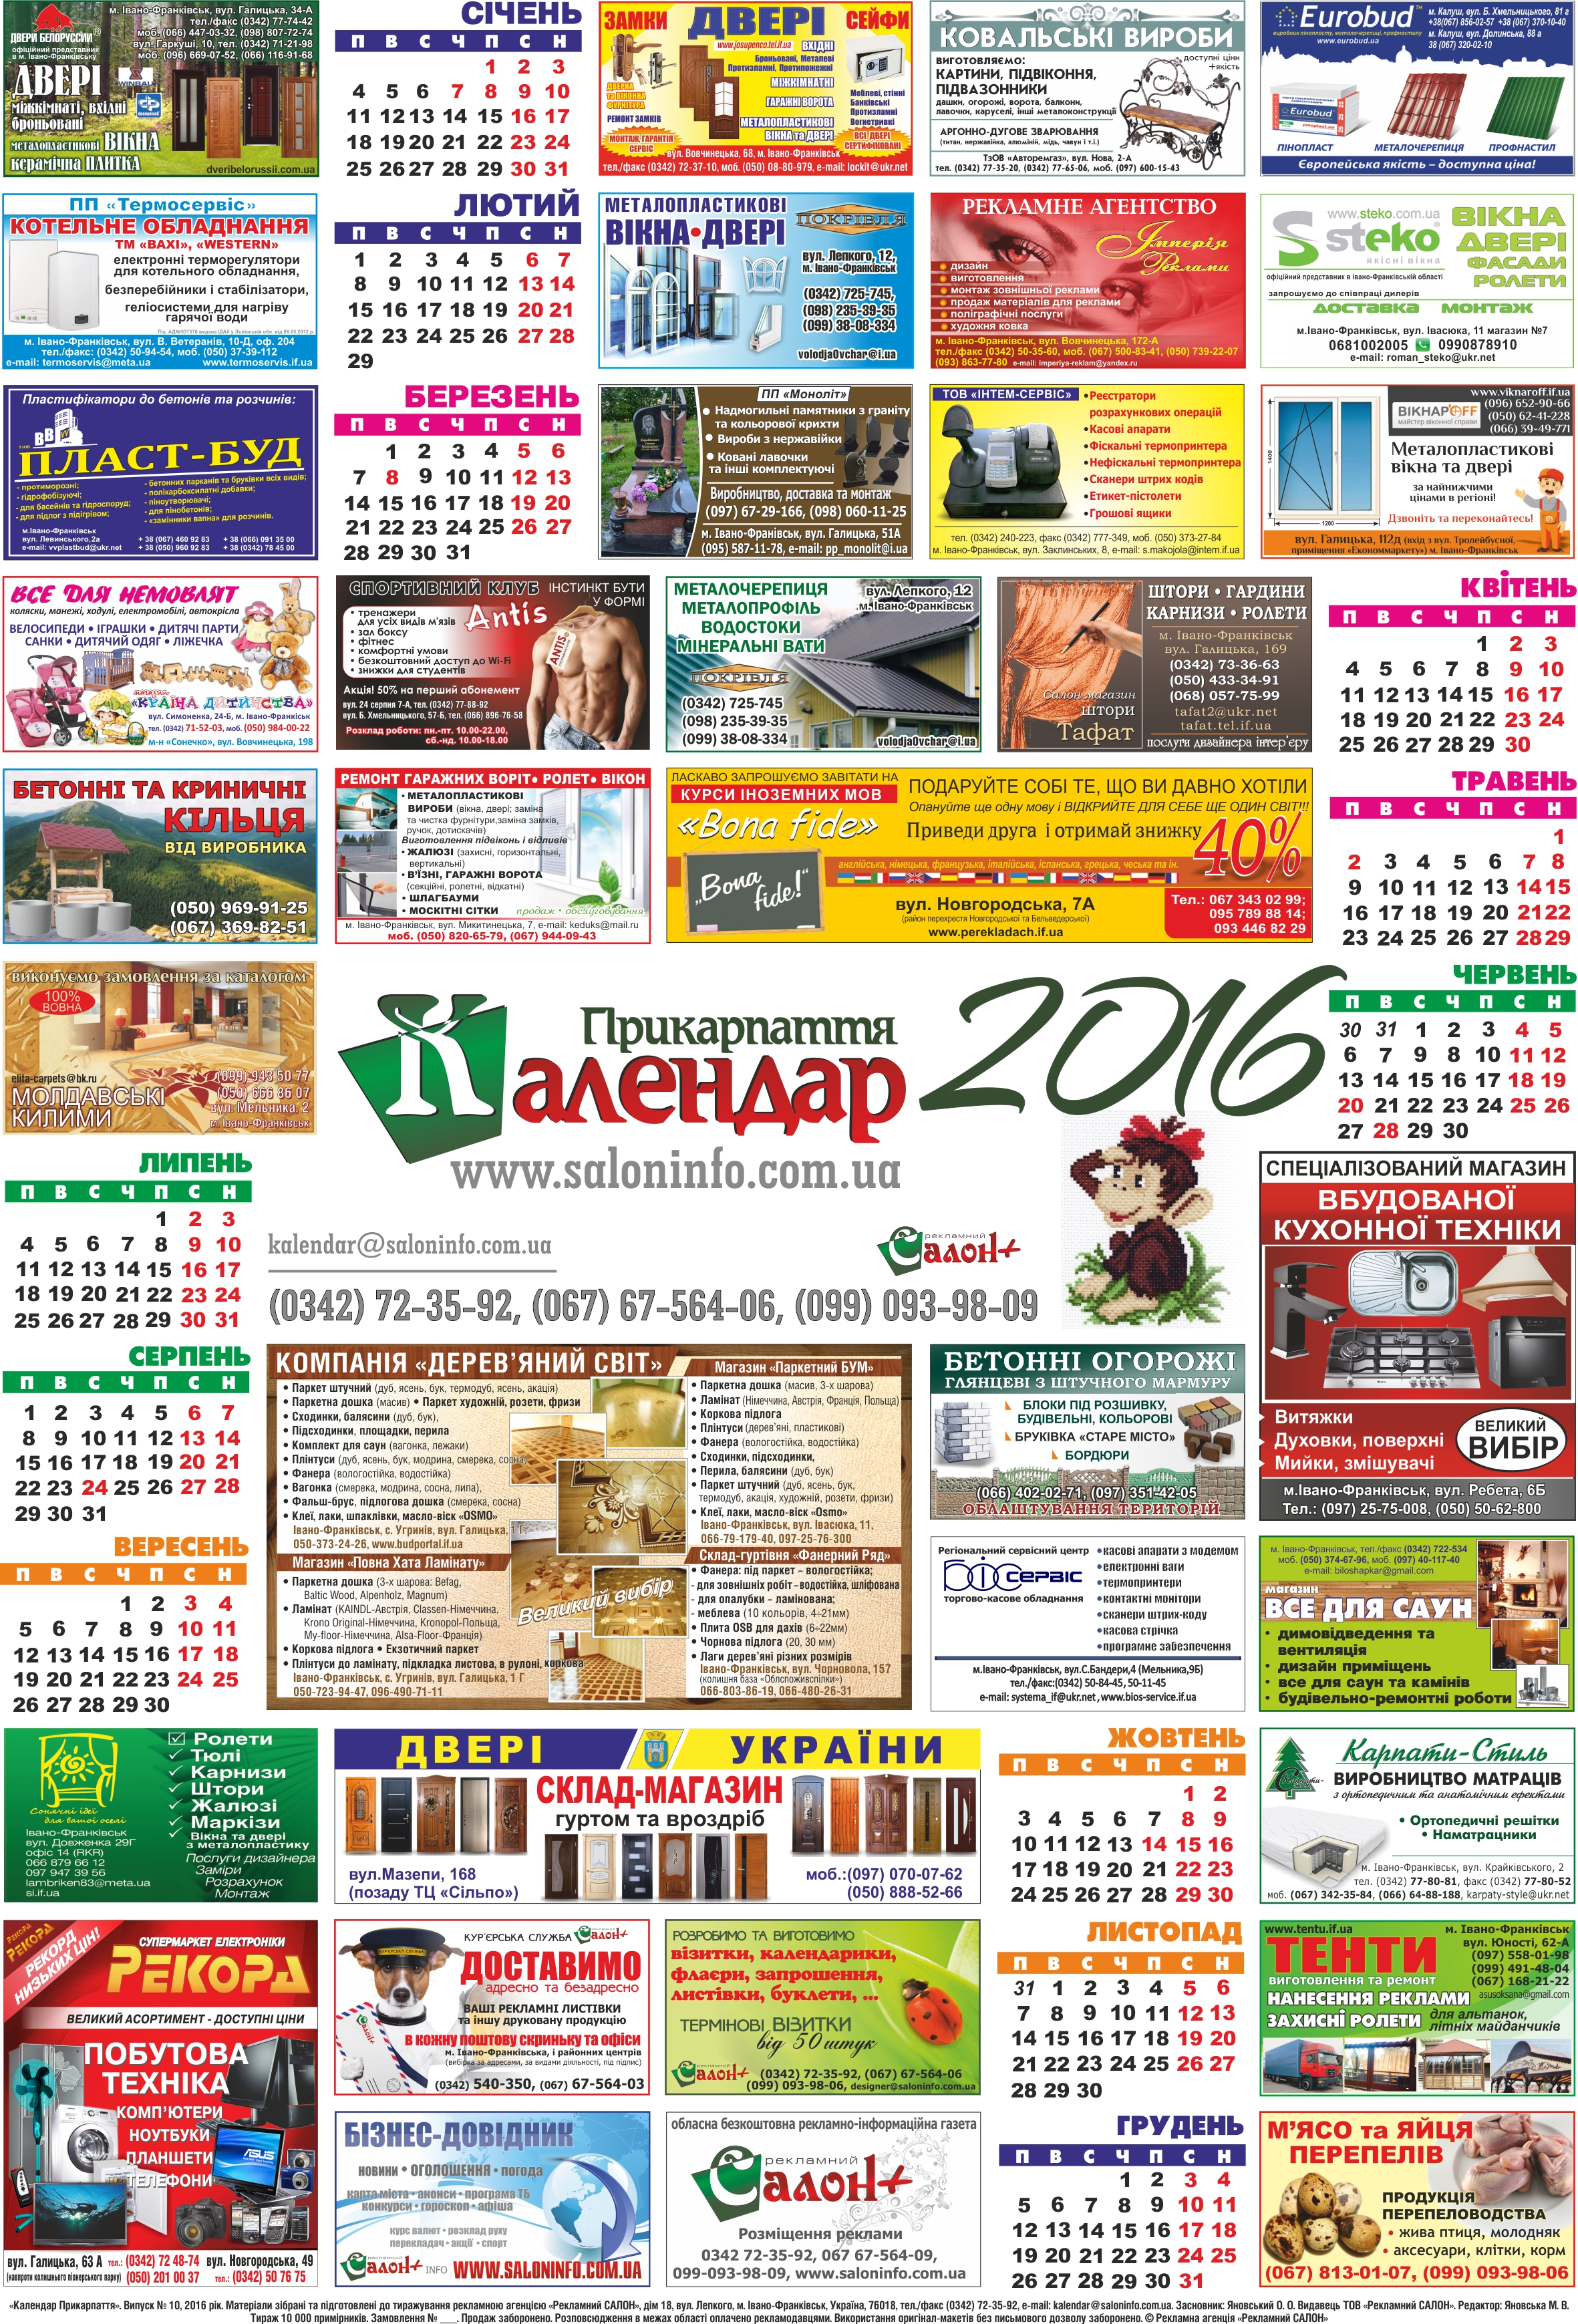 Picture 2 - kalendar_ 2016.jpg